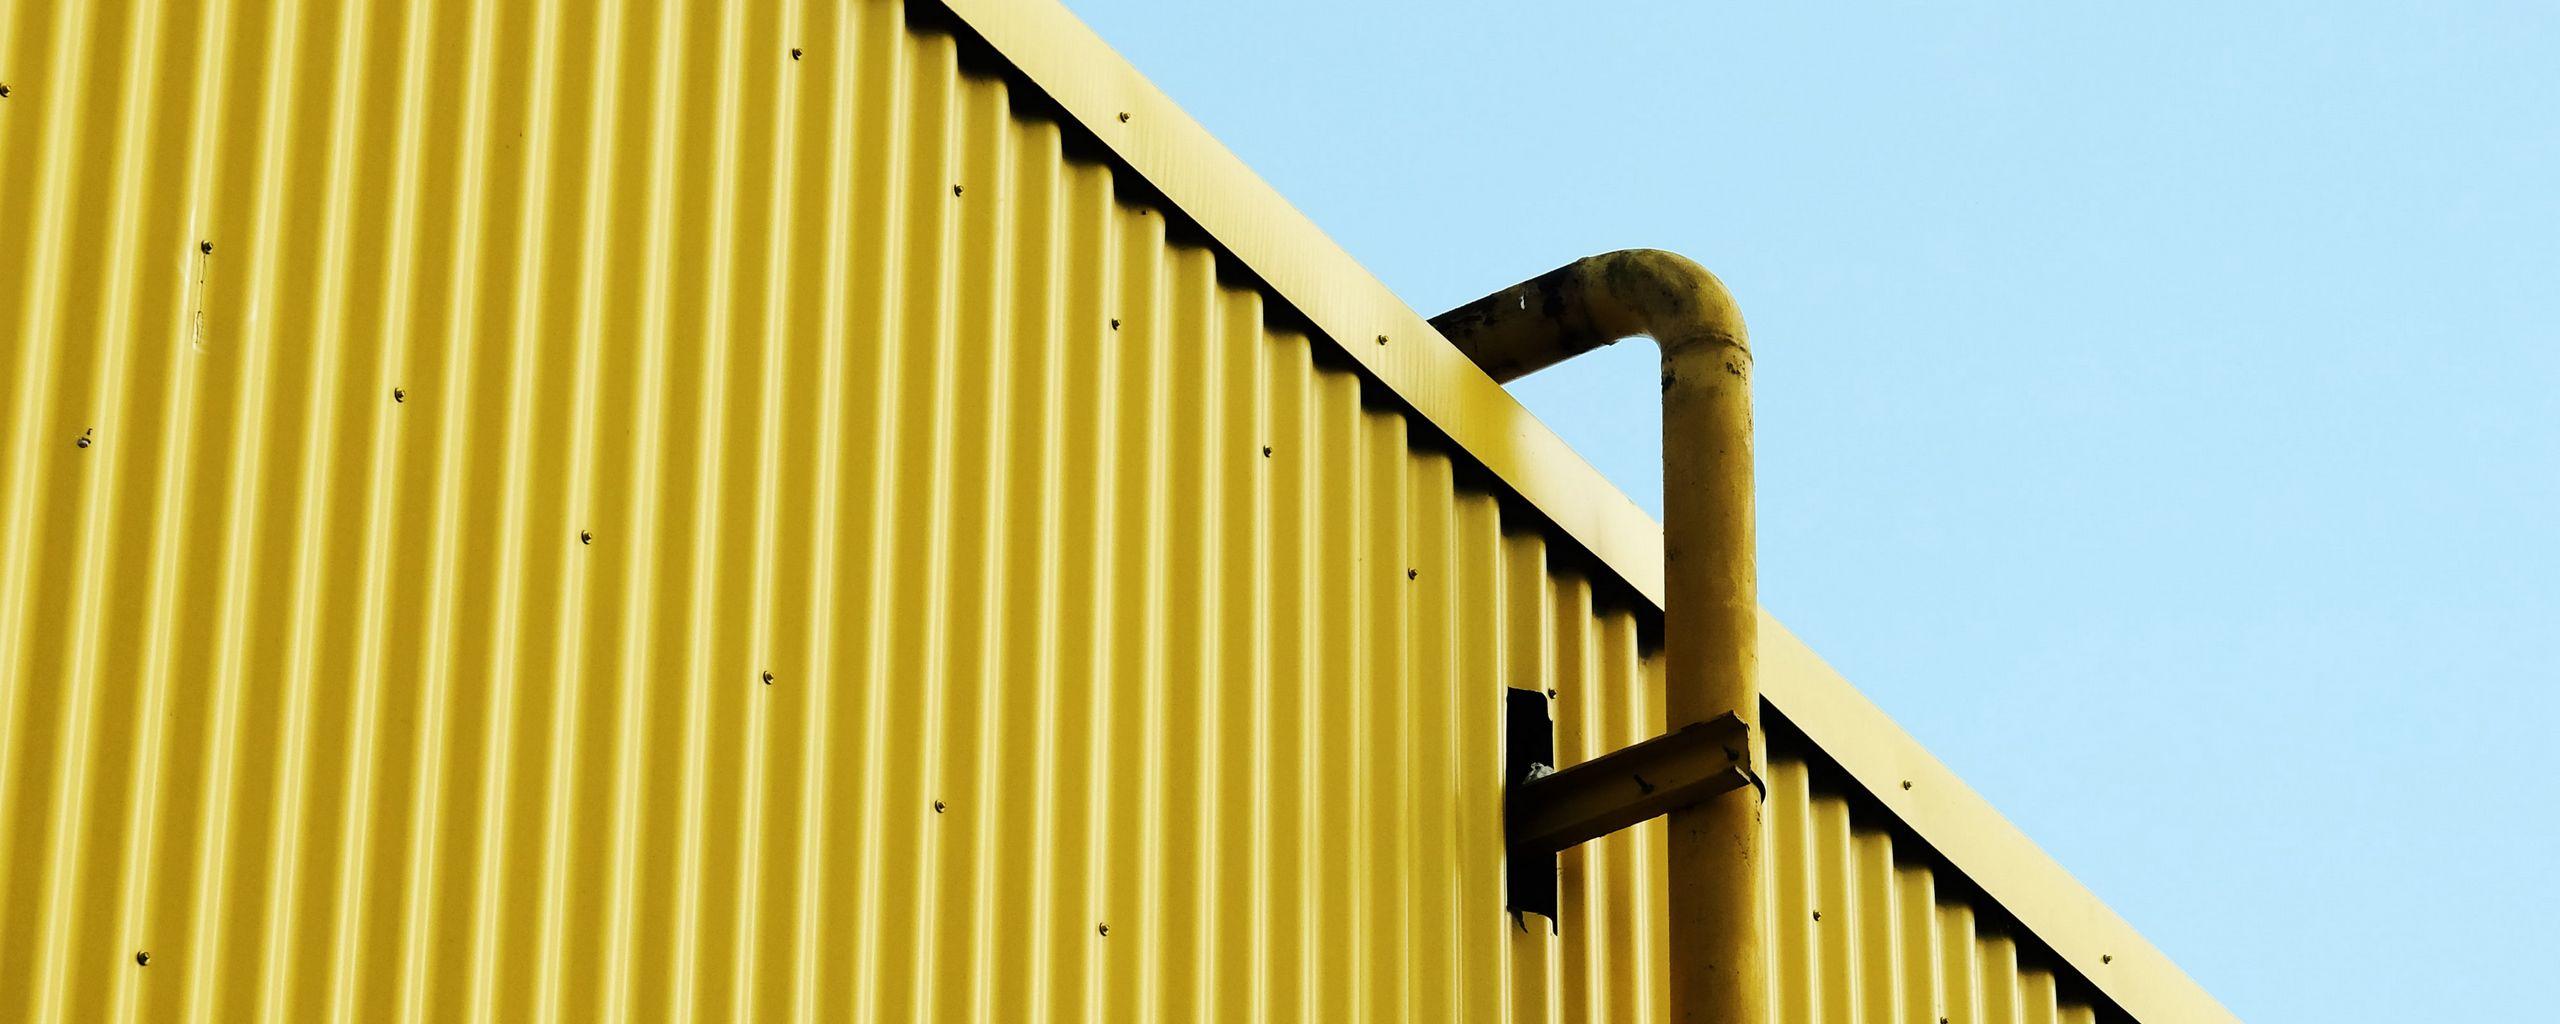 2560x1024 Wallpaper building, pipe, yellow, minimalism